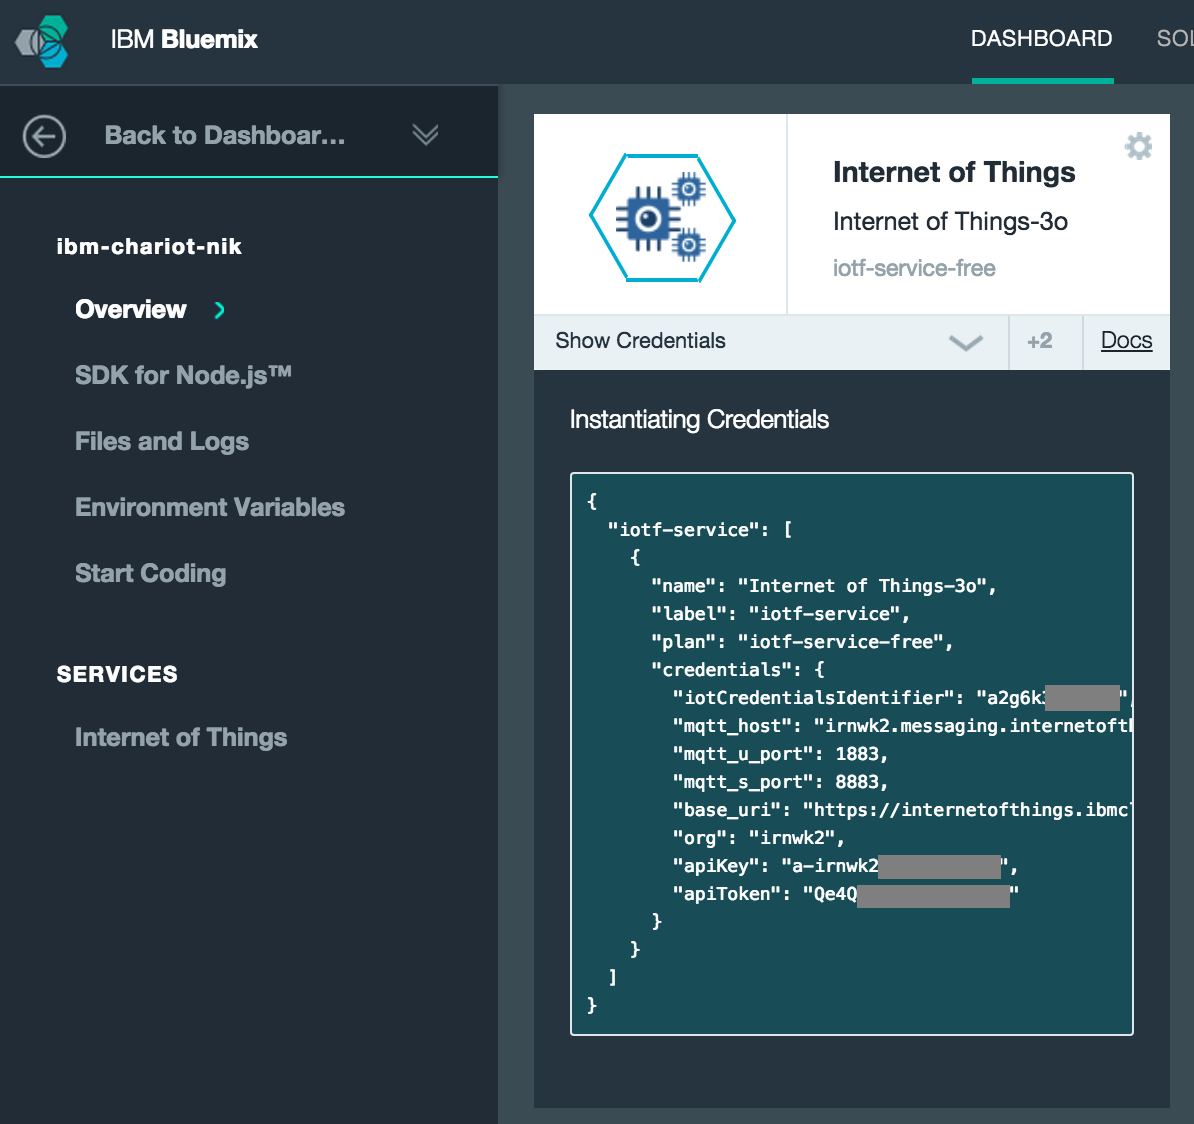 creating applications in ibm bluemix